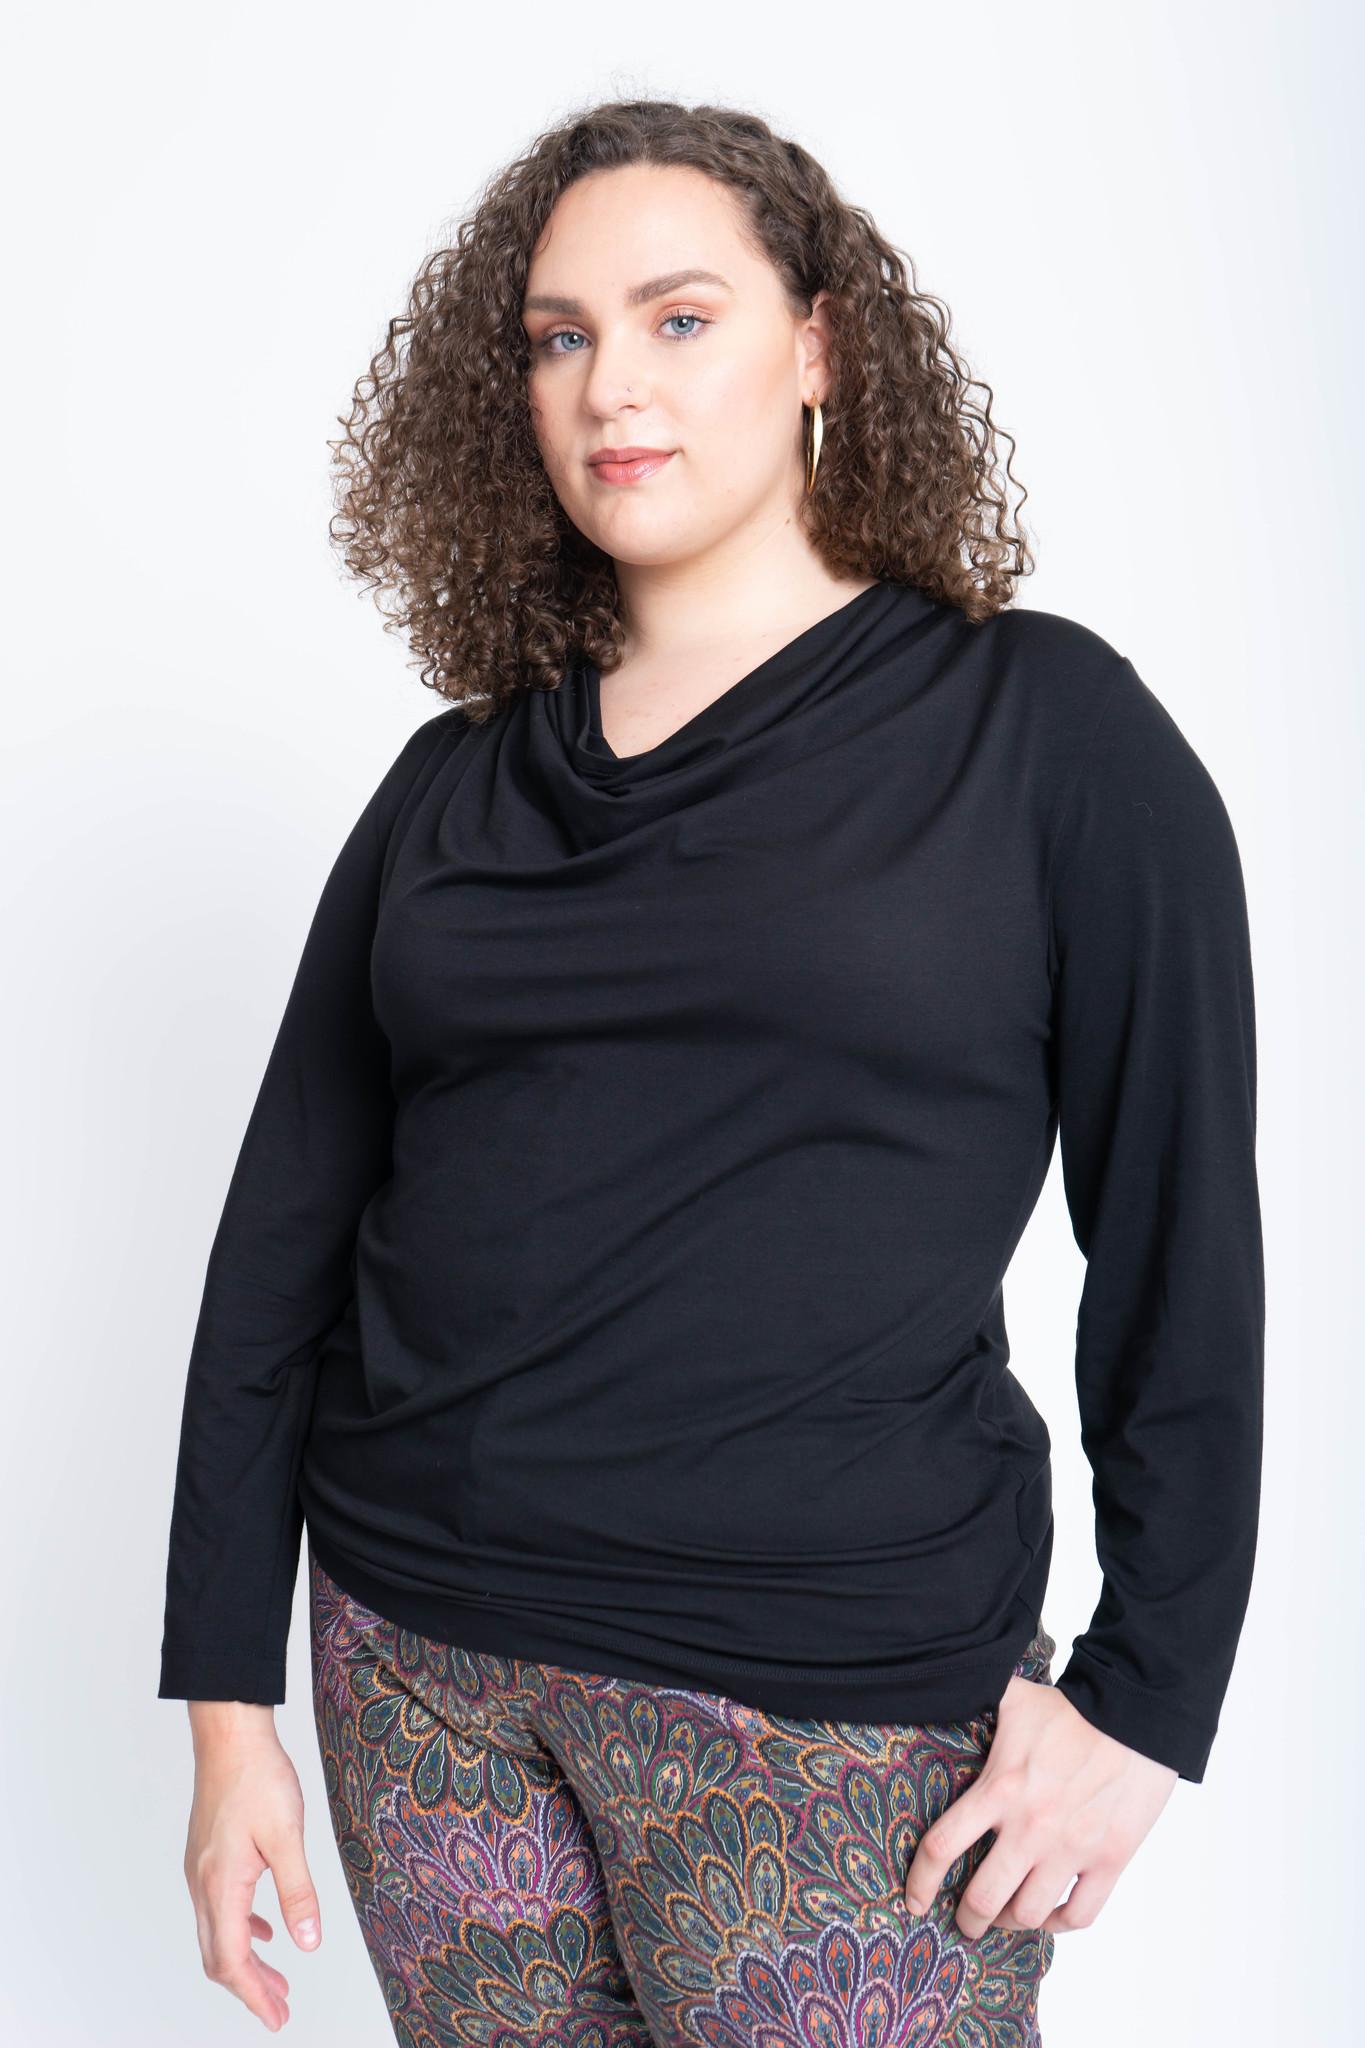 VENUS Shirt aus Viskose und Seide-1